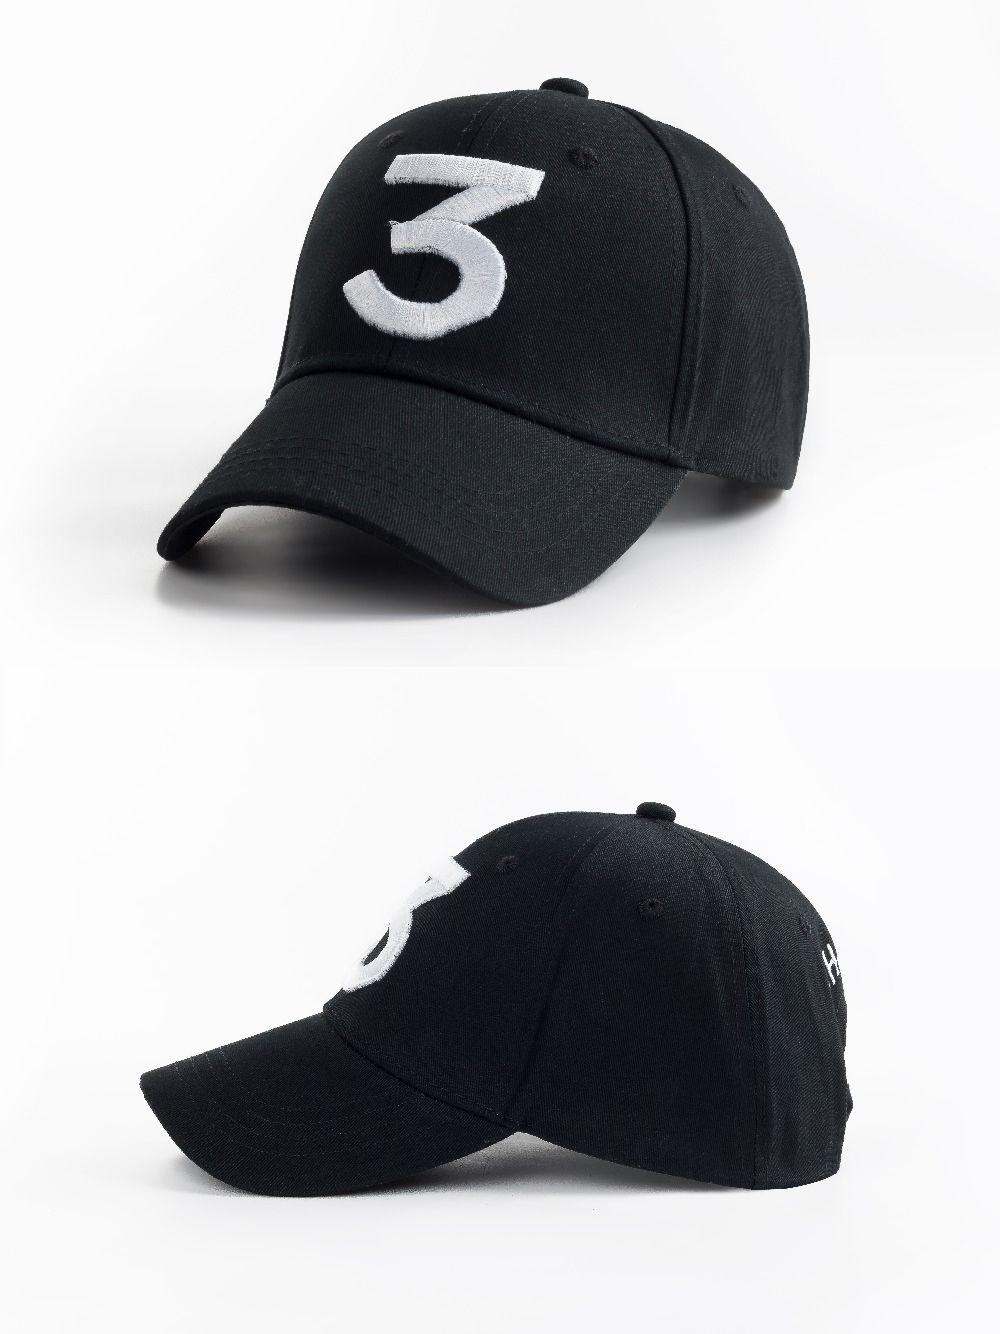 fda21410fcc Popular chance the rapper 3 Hat Cap Black Letter Embroidery Baseball Cap Hip  Hop Streetwear Strapback Snapback Sun Hat Bone